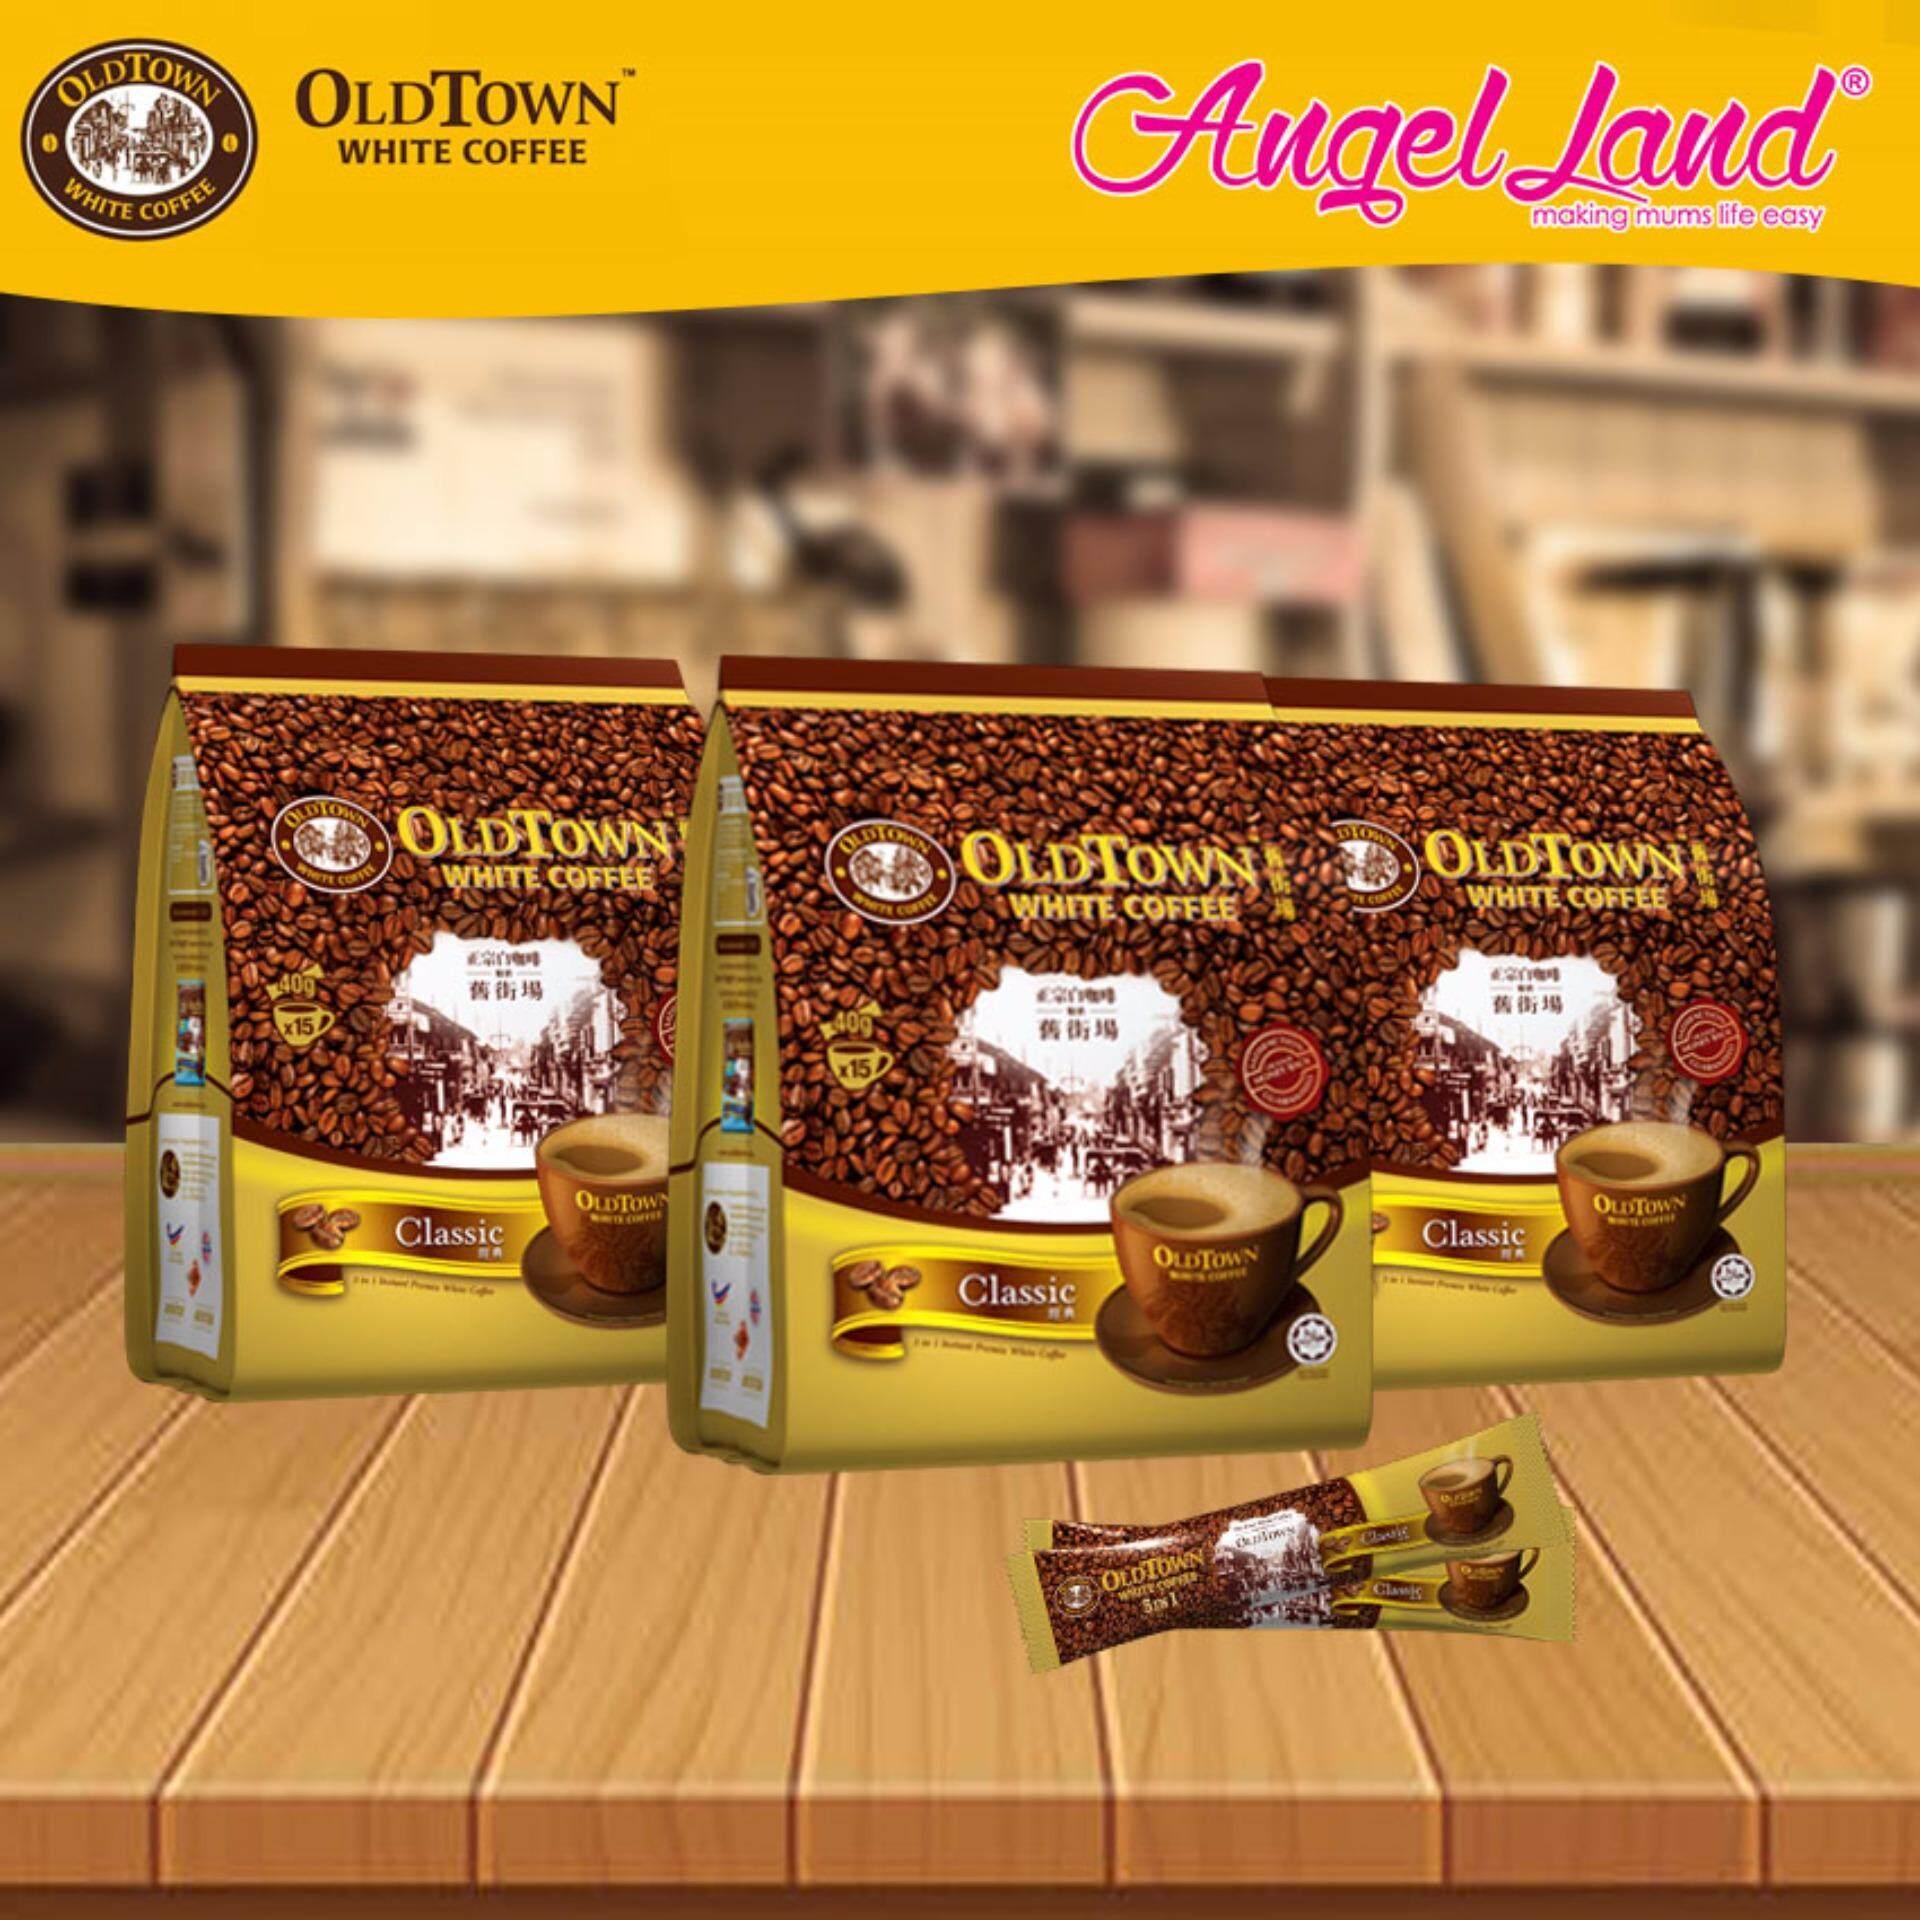 Coffee By Old Town Reviews Ratings And Best Price In Kl Selangor White 3 1 Classic Kopi Klasik Oldtown Instant Premix X 3packs